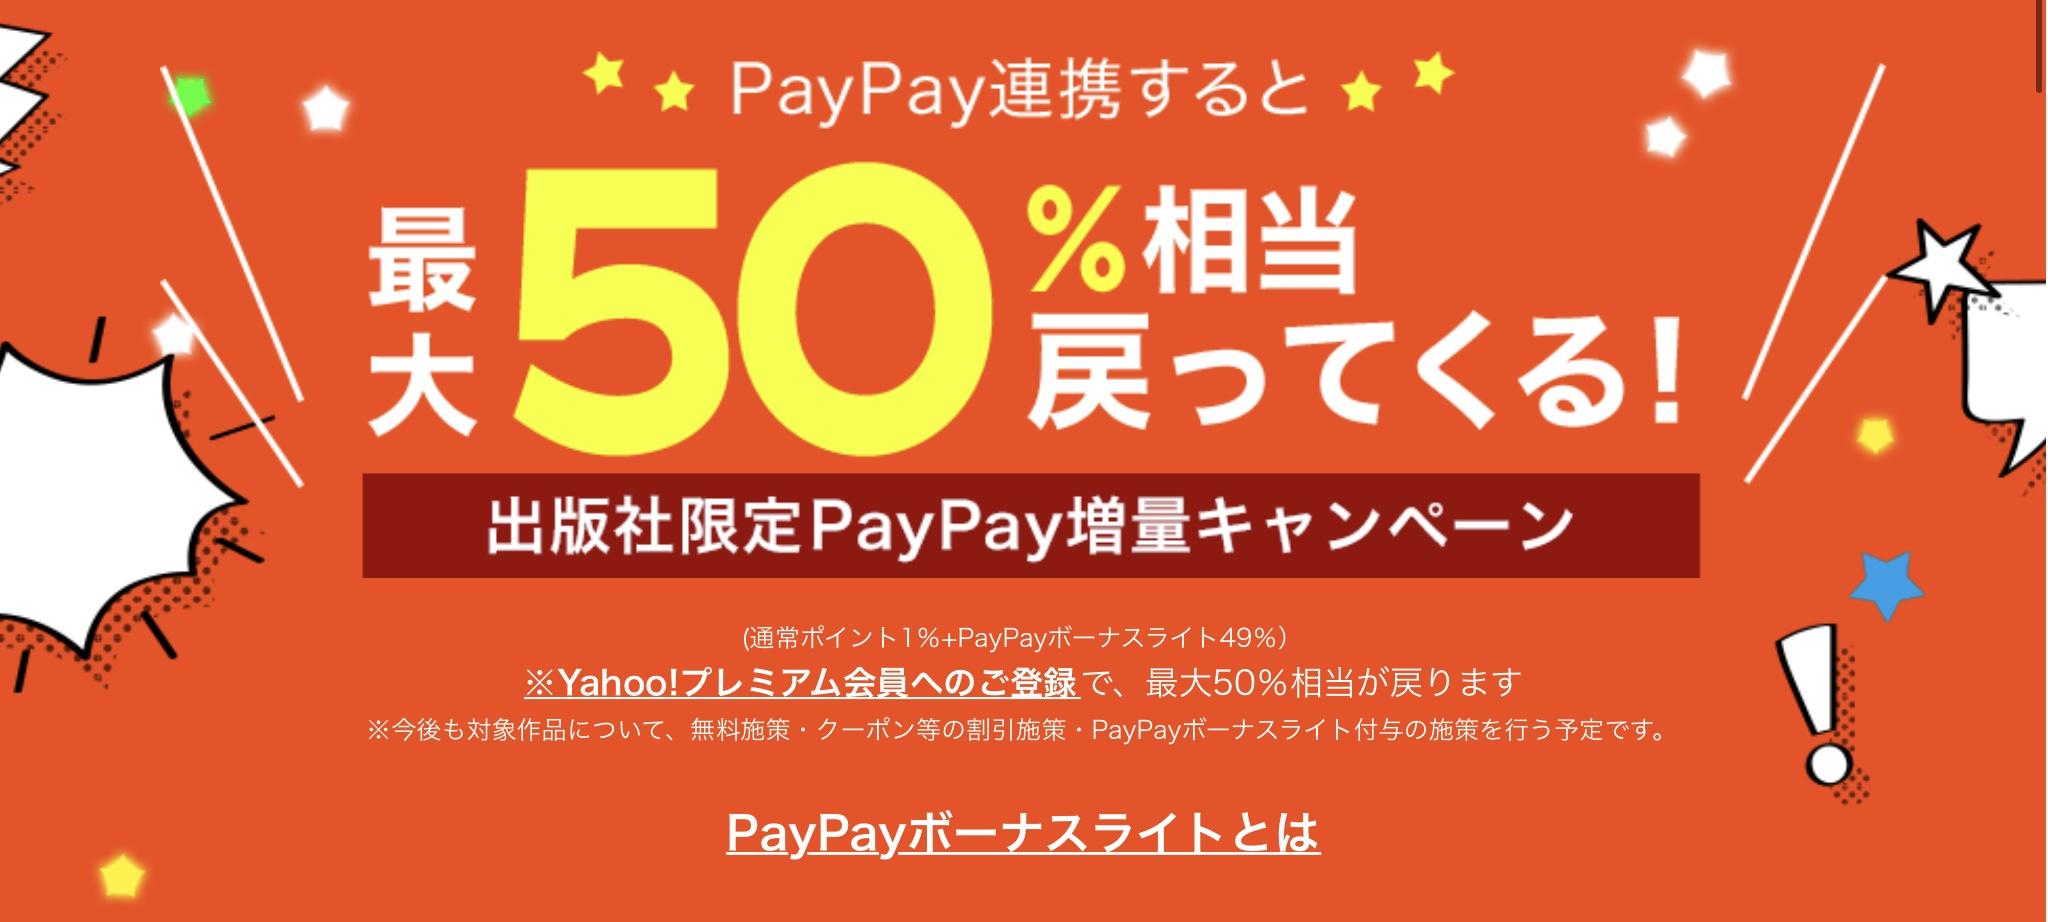 ebookjapan PayPay